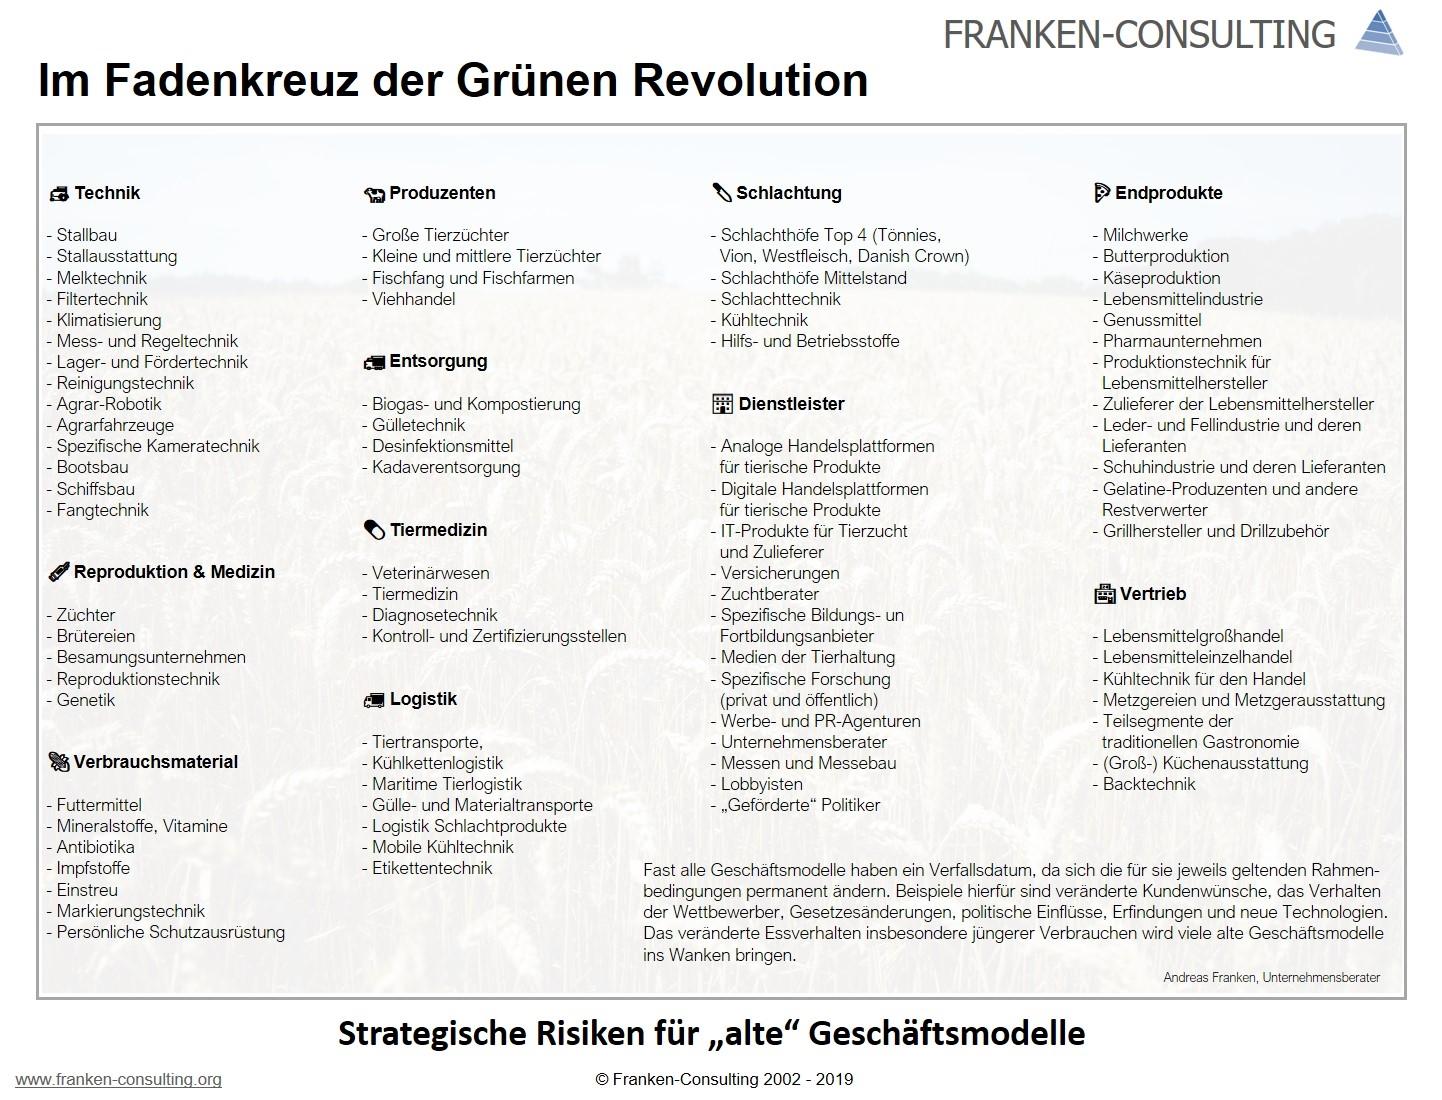 FRANKEN-CONSULTING die Grüne Revolution